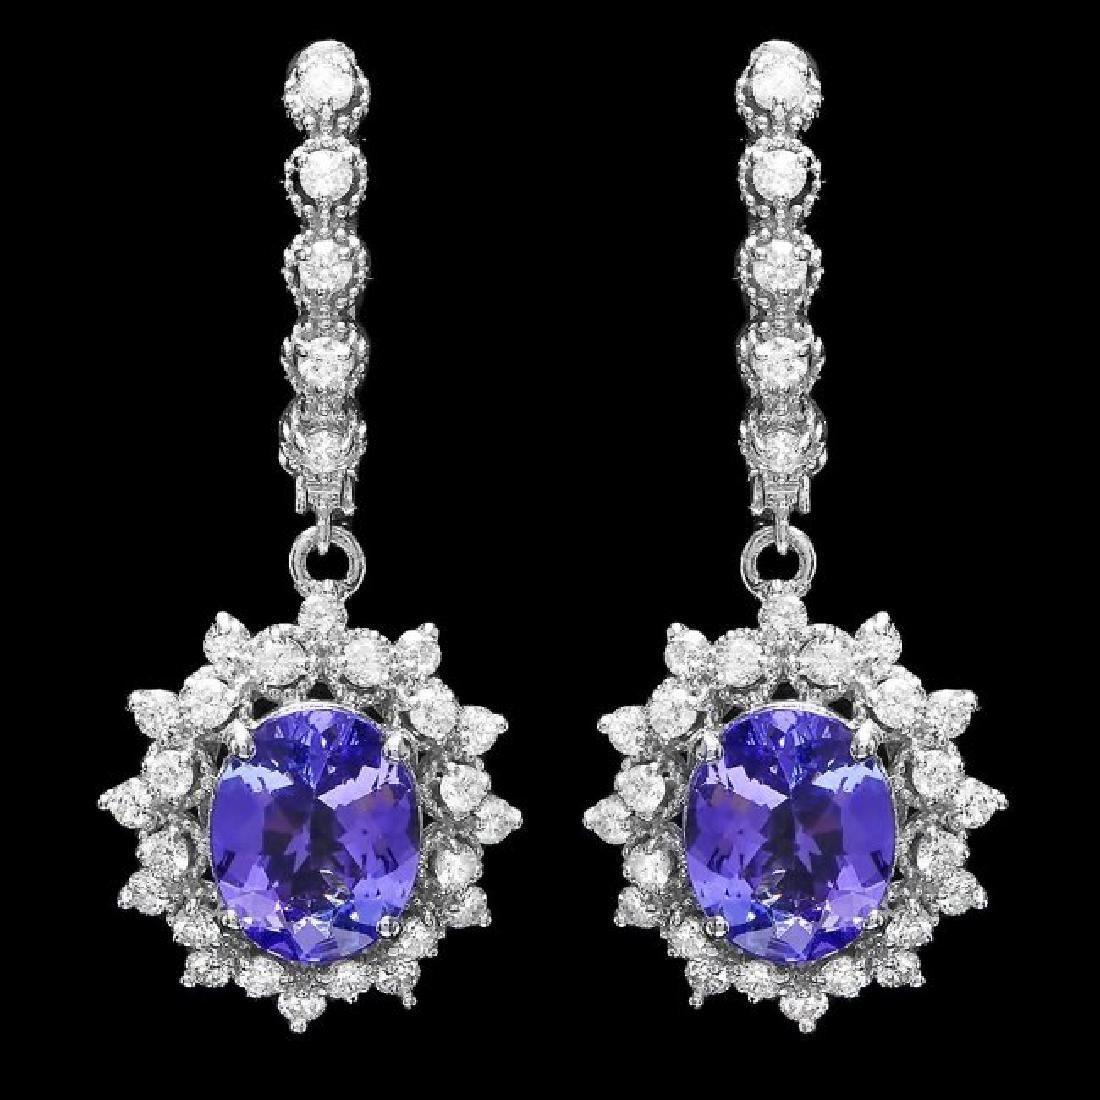 14k Gold 4.50ct Tanzanite 1.70ct Diamond Earrings